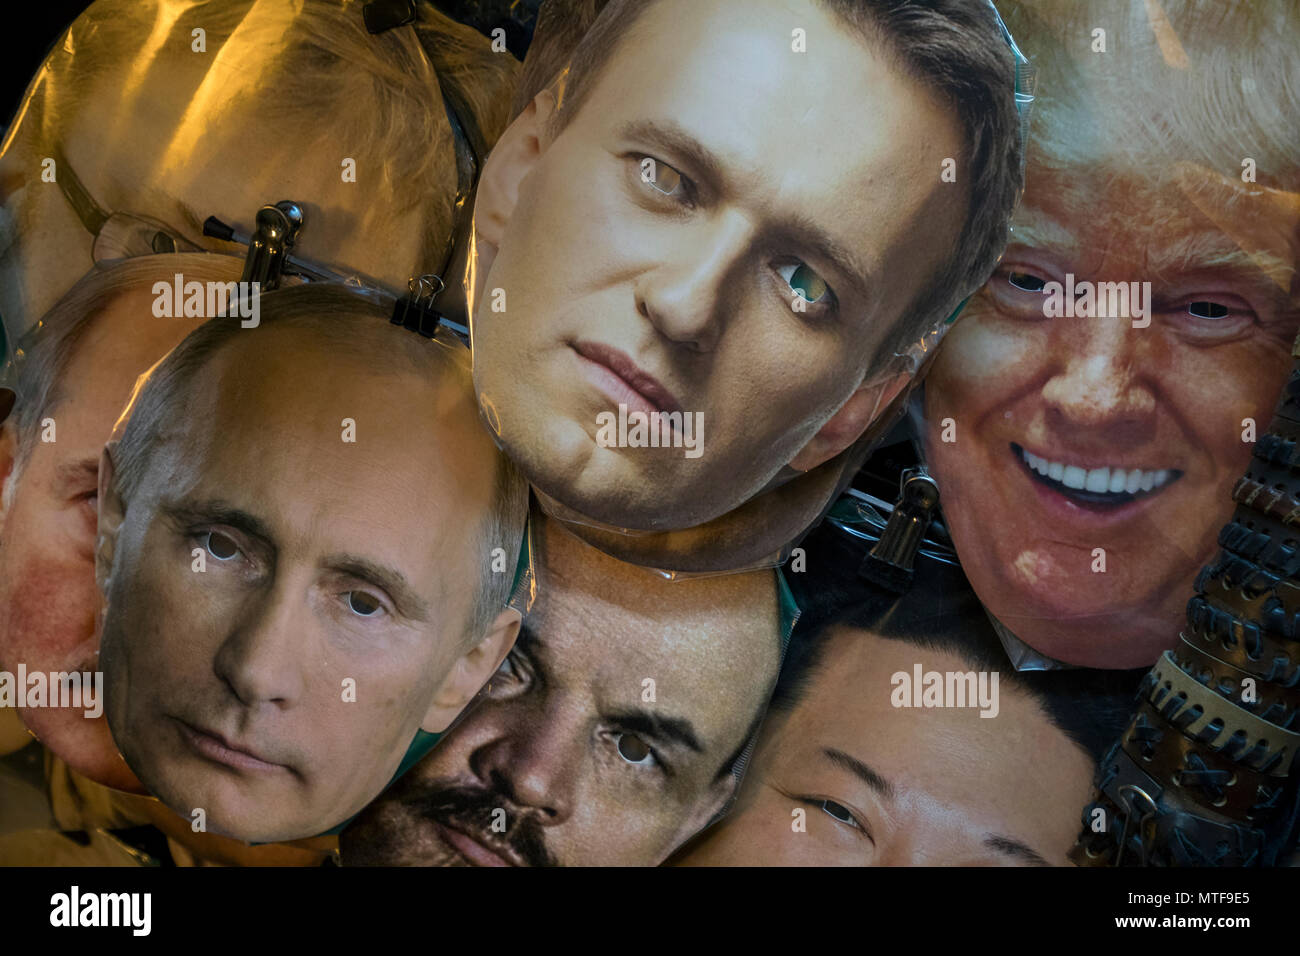 Masks Of Vladimir Putin Alexei Navalny Vladimir Lenin Donald Trump Lie On A Counter Of A Souvenir Stand On Nevsky Prospekt In St Petersburg Russi Stock Photo Alamy